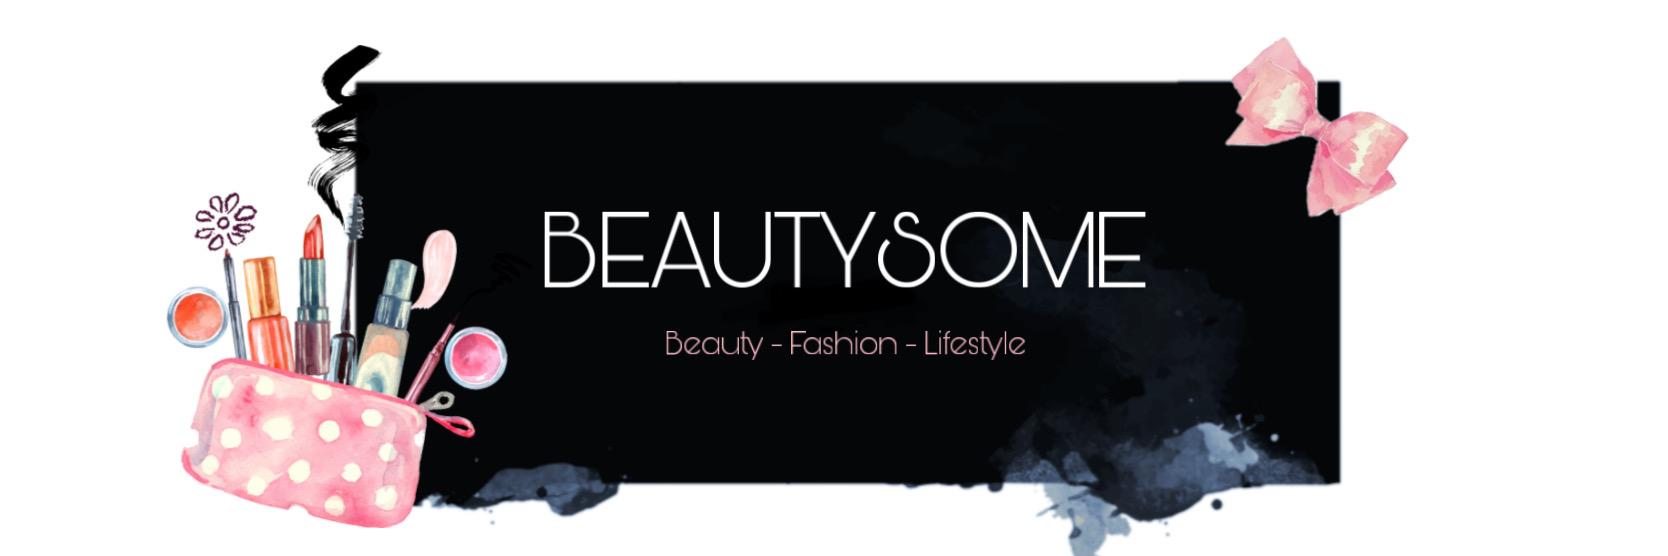 Beautysome, yustsome, beautyblog, fashionblog, lifestyleblog,PR, samenwerking